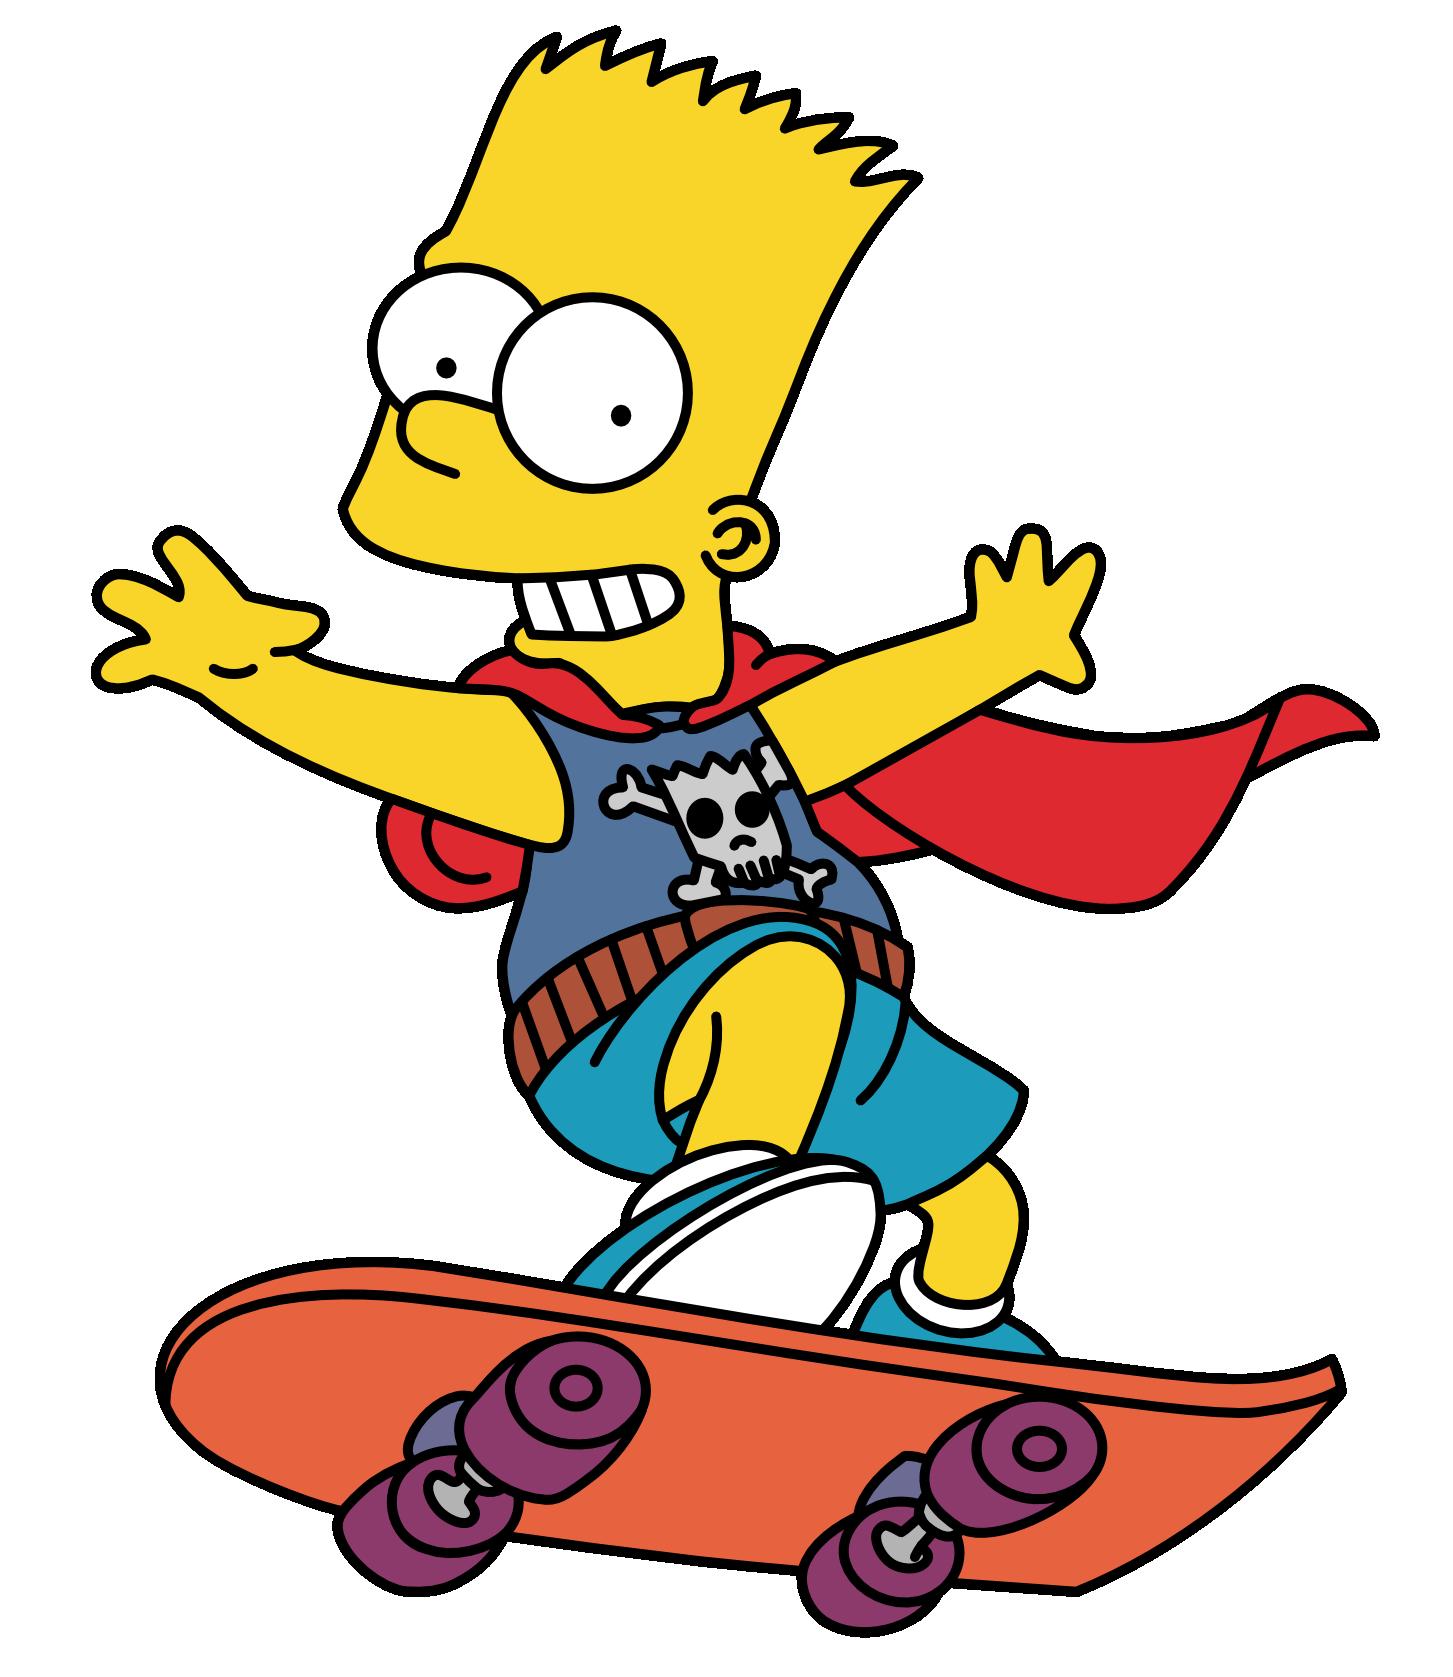 Download Bart Simpson Png Images Transparent Gallery. Advertisement - Bart Simpson, Transparent background PNG HD thumbnail